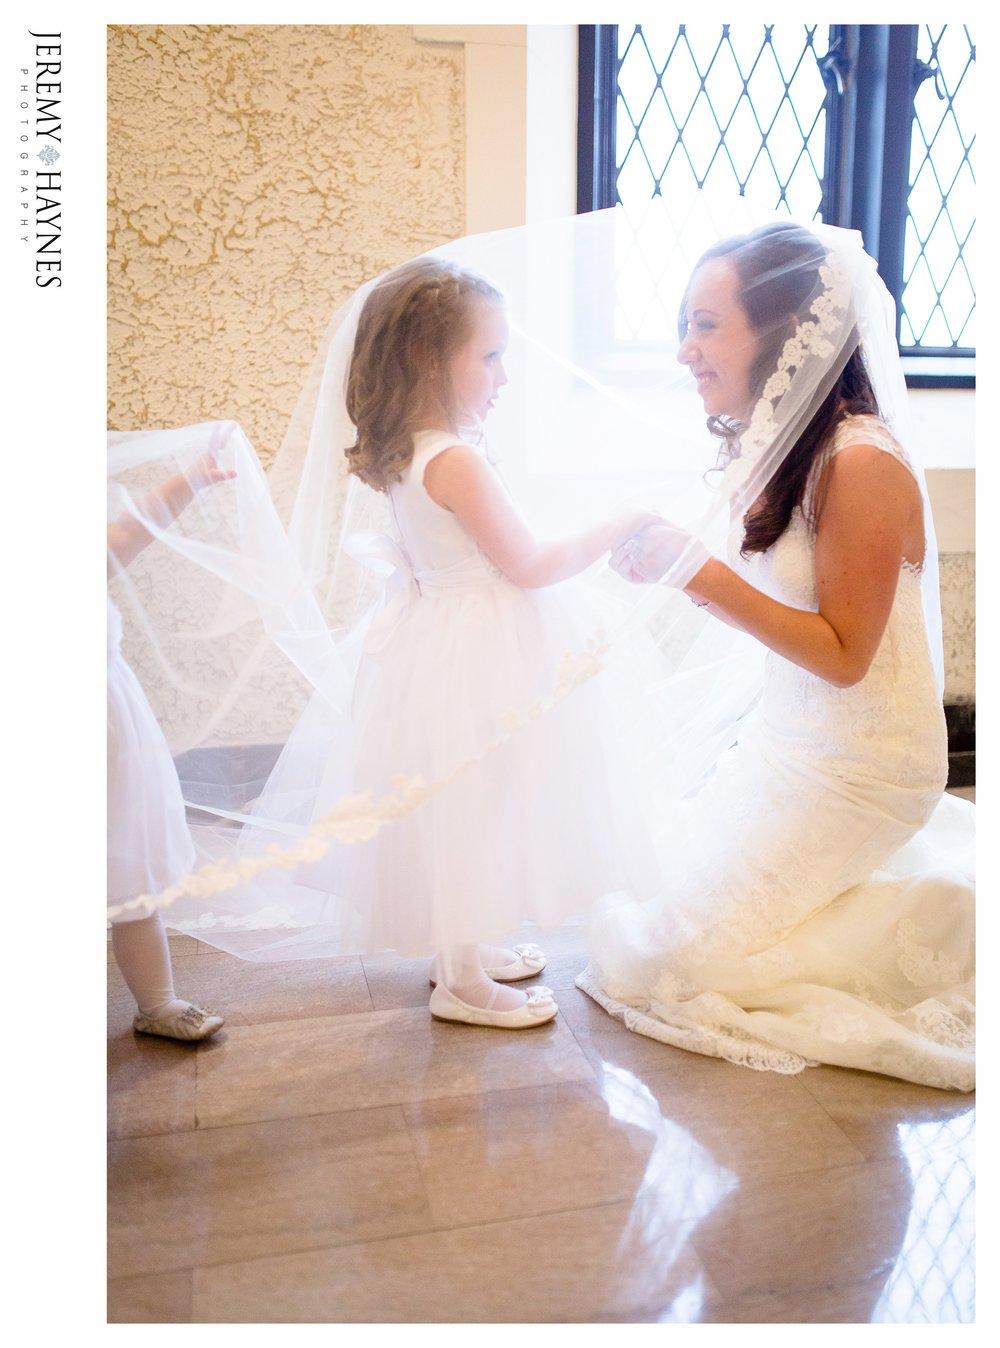 fun-moments-wedding.jpg